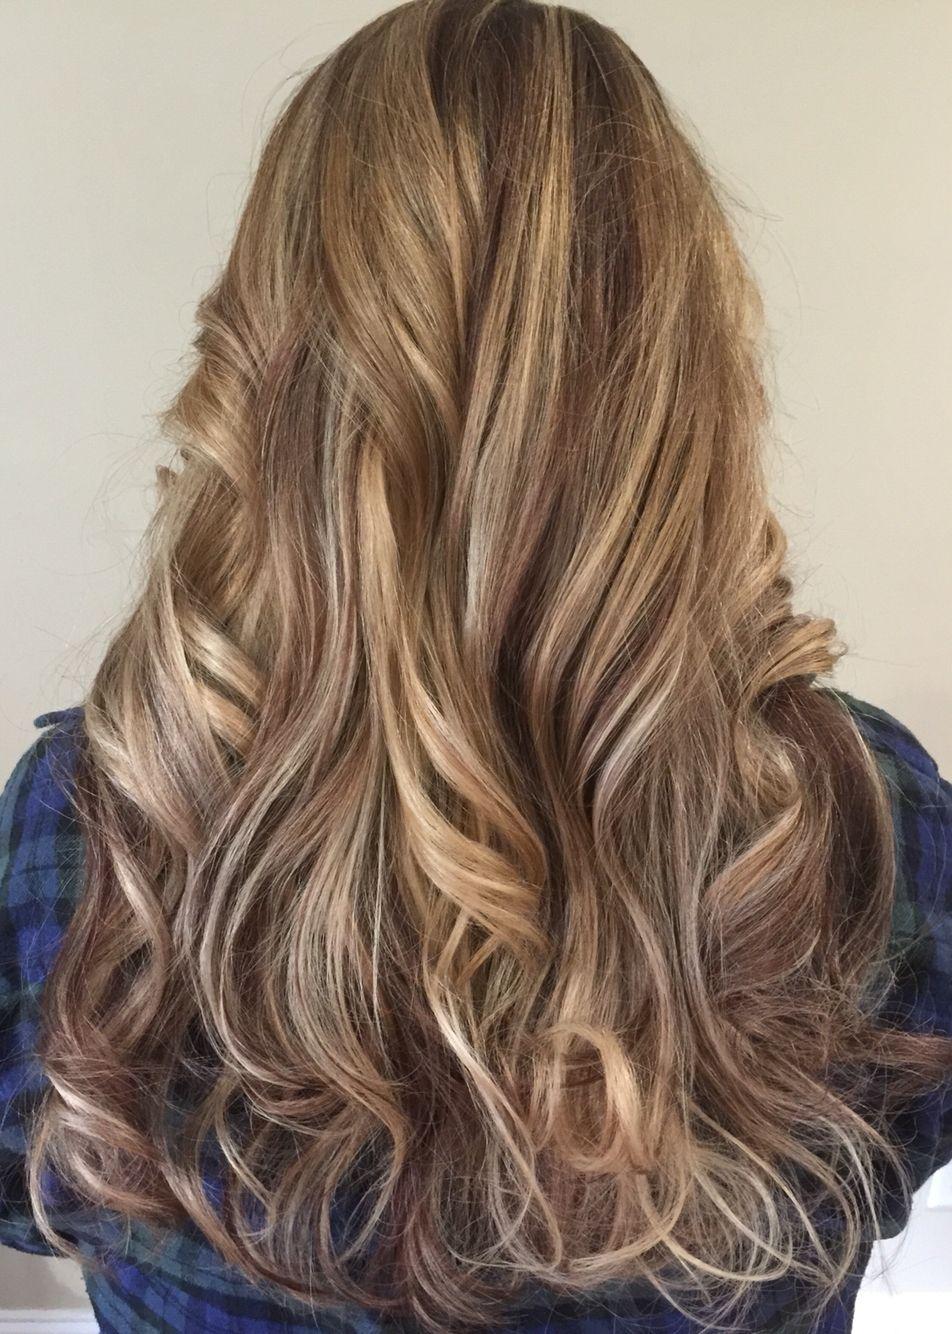 Blonde Highlights Against Mocha Color Blonde Highlights Hair